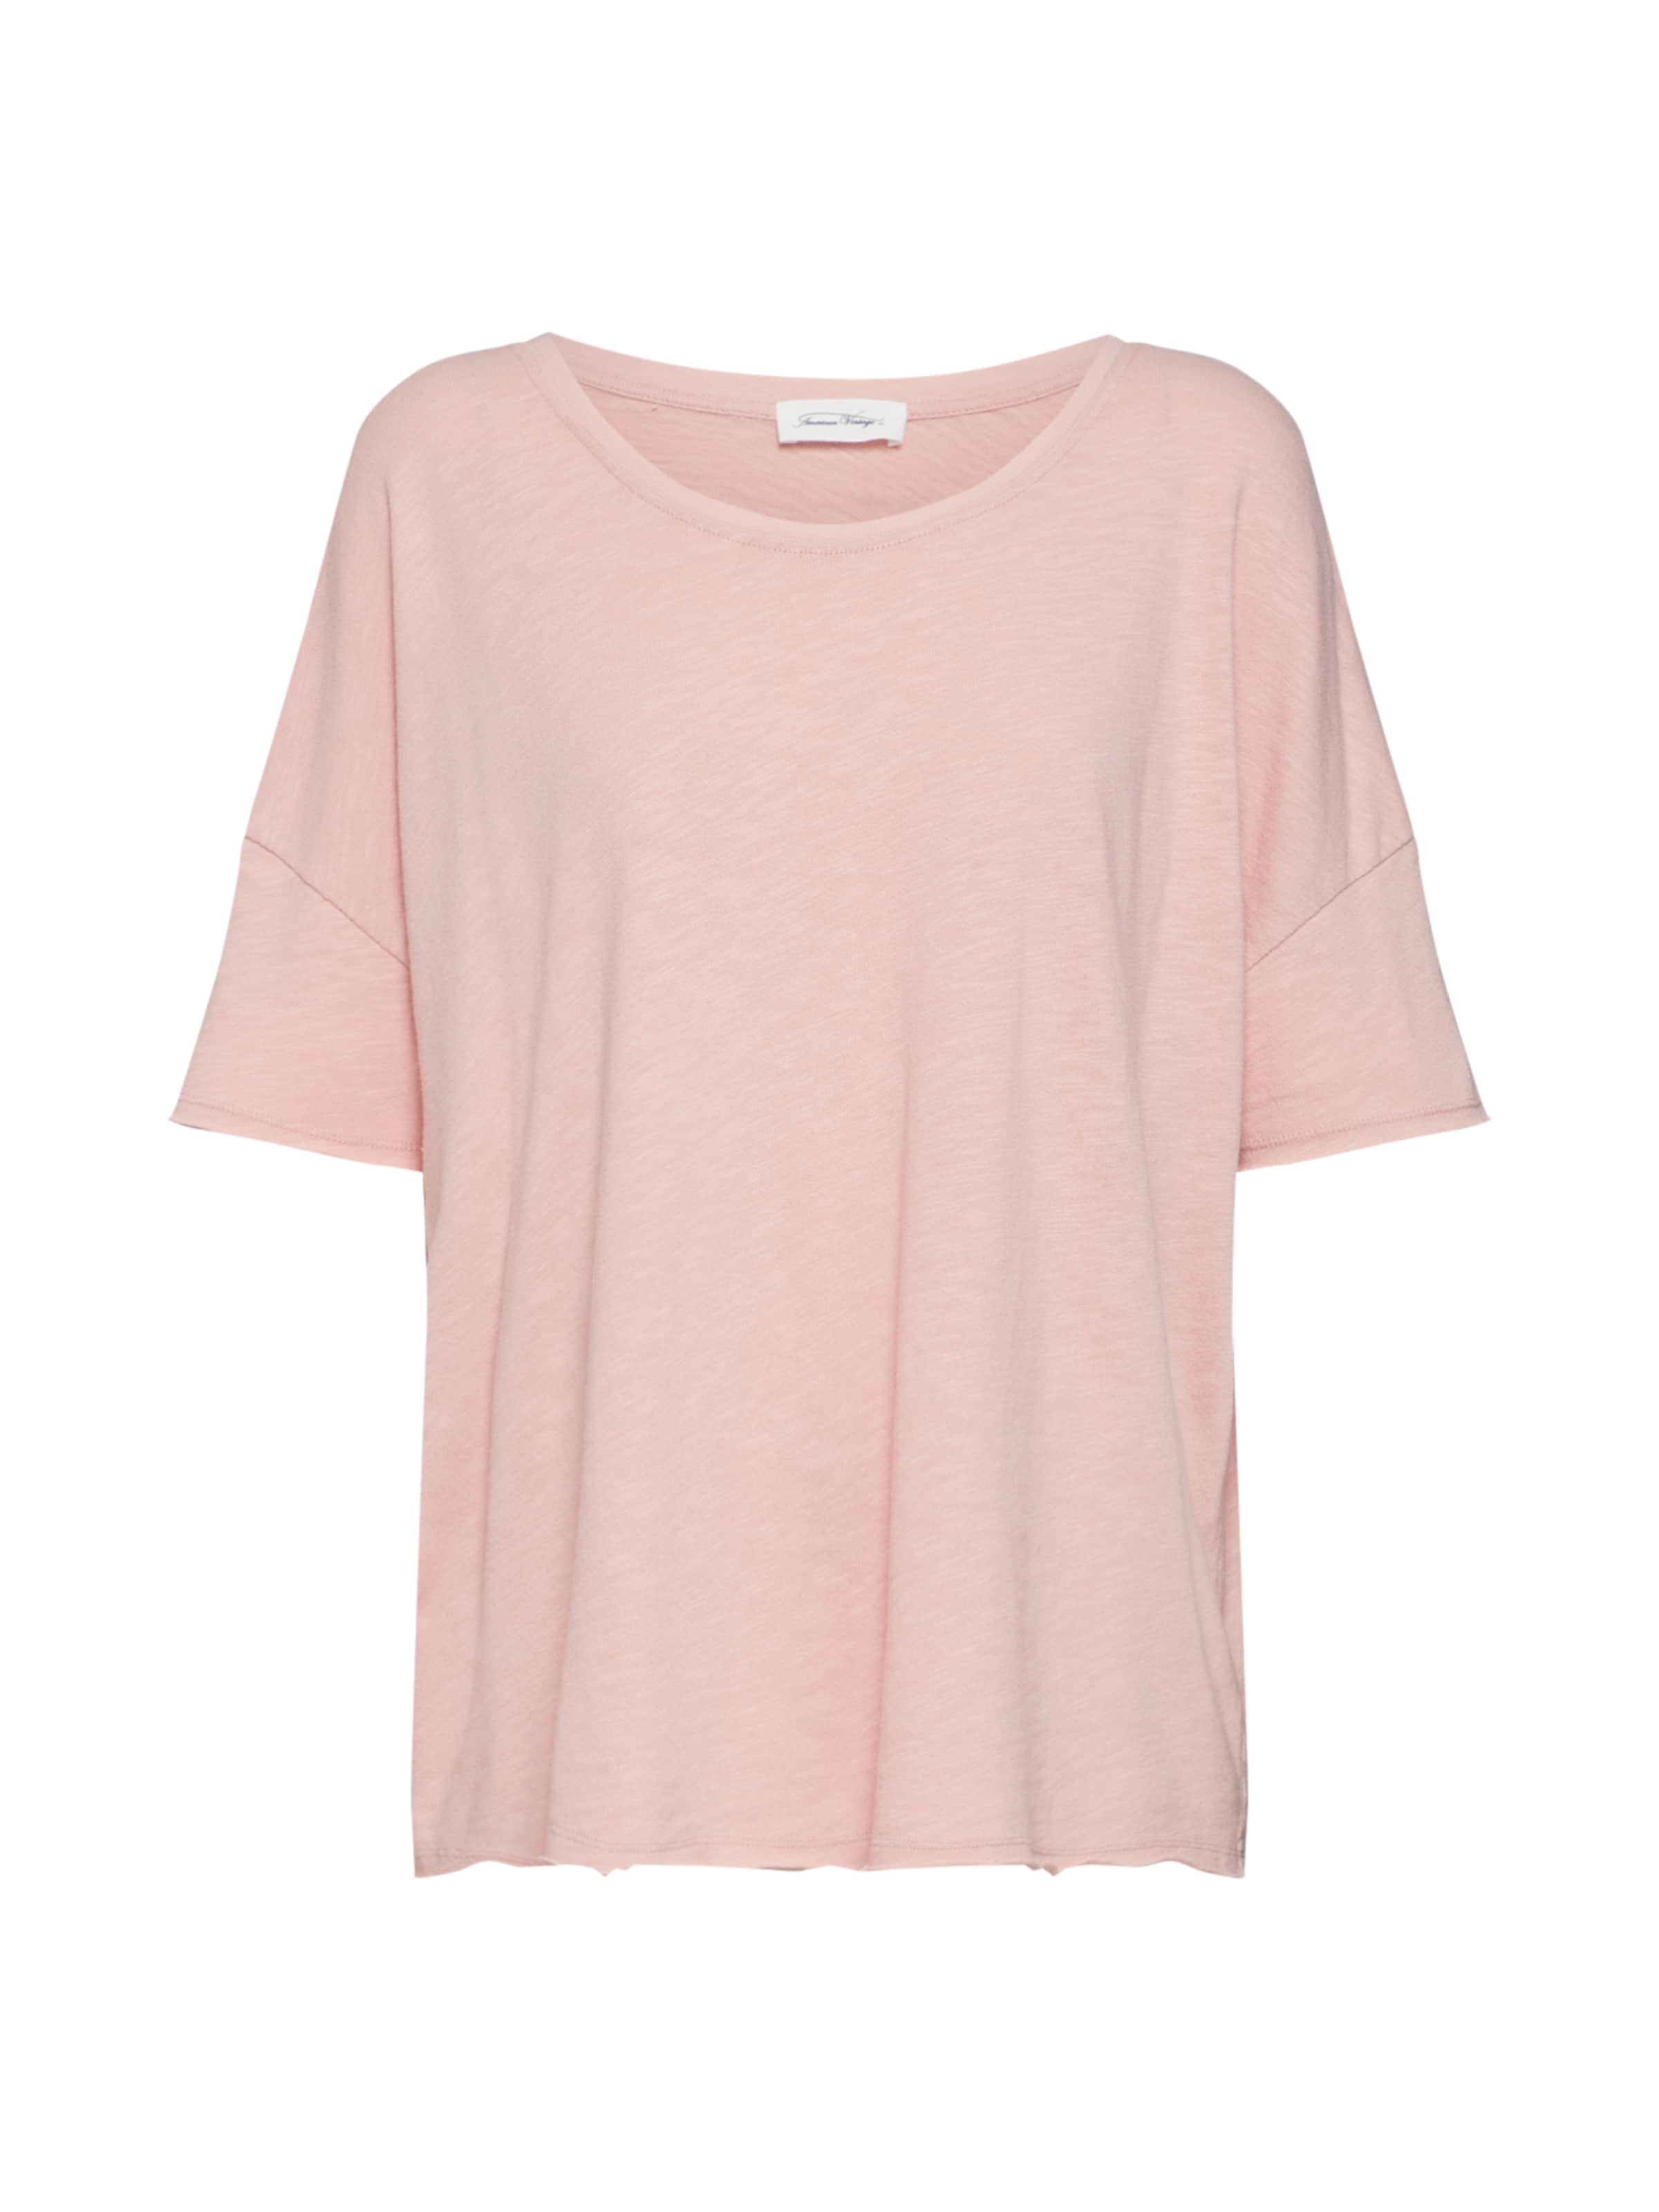 Vintage Nude American Shirt In 3AjL54Rq